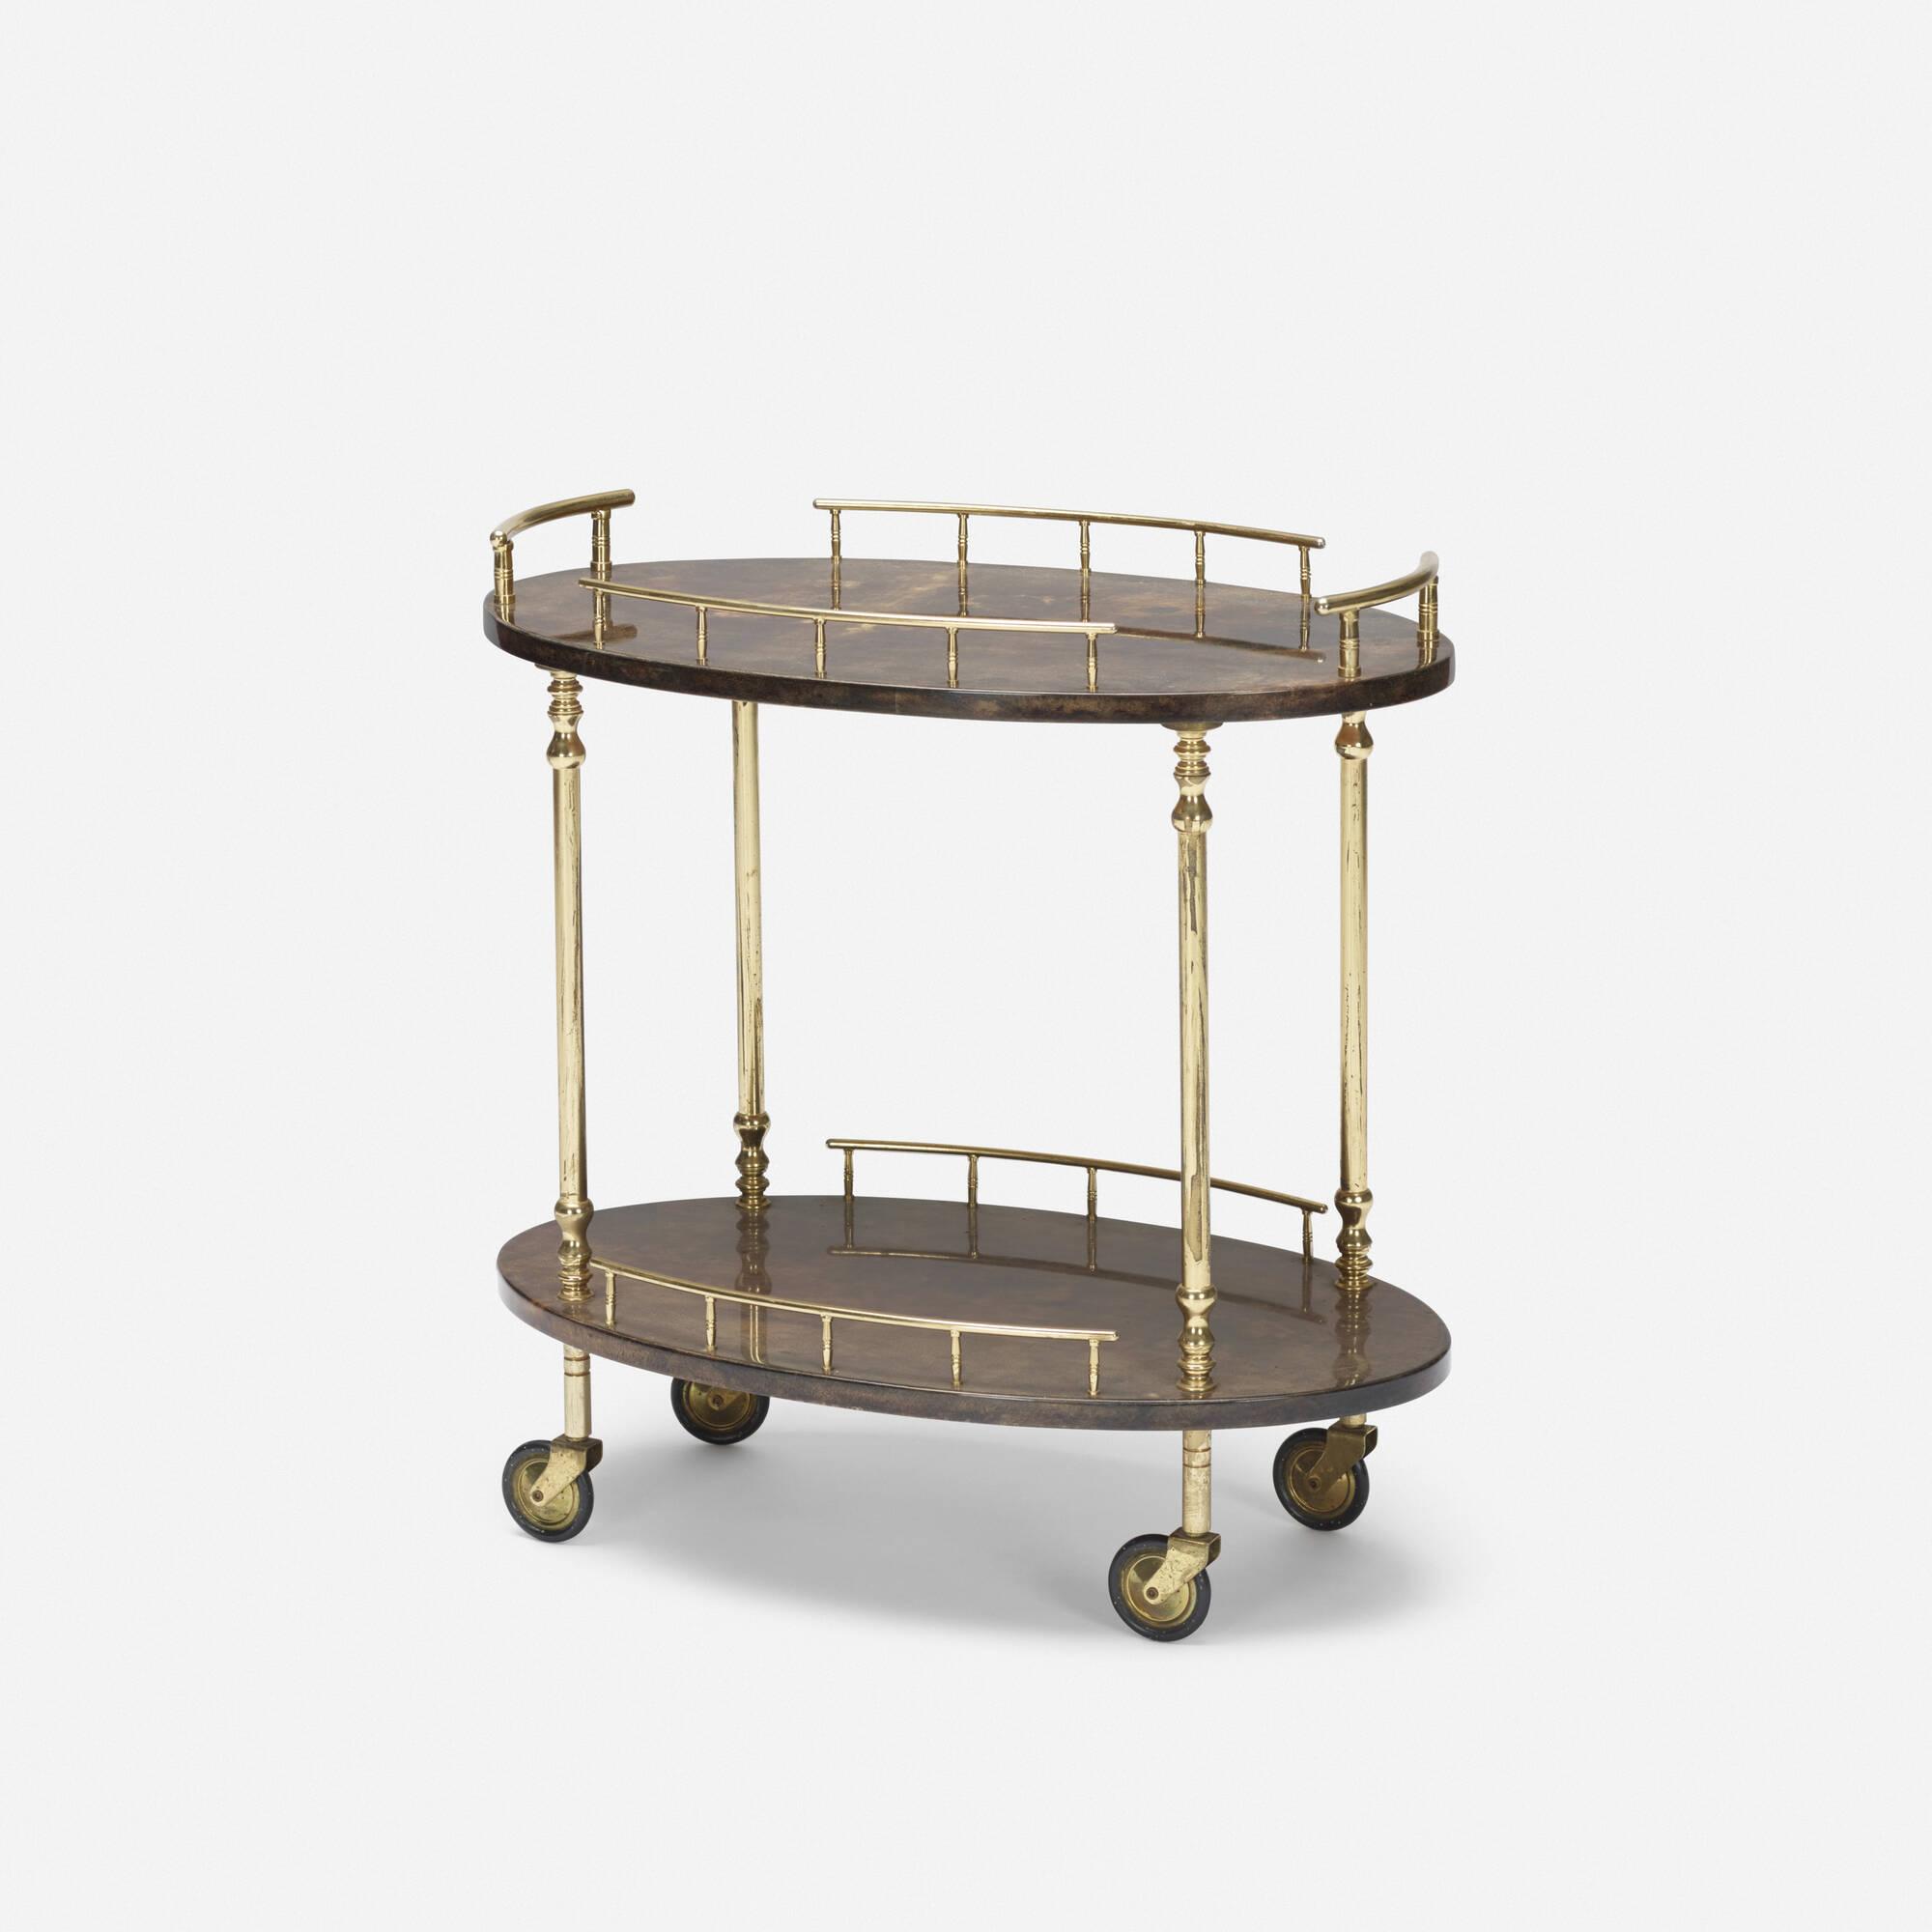 329: Aldo Tura / tea cart (1 of 1)